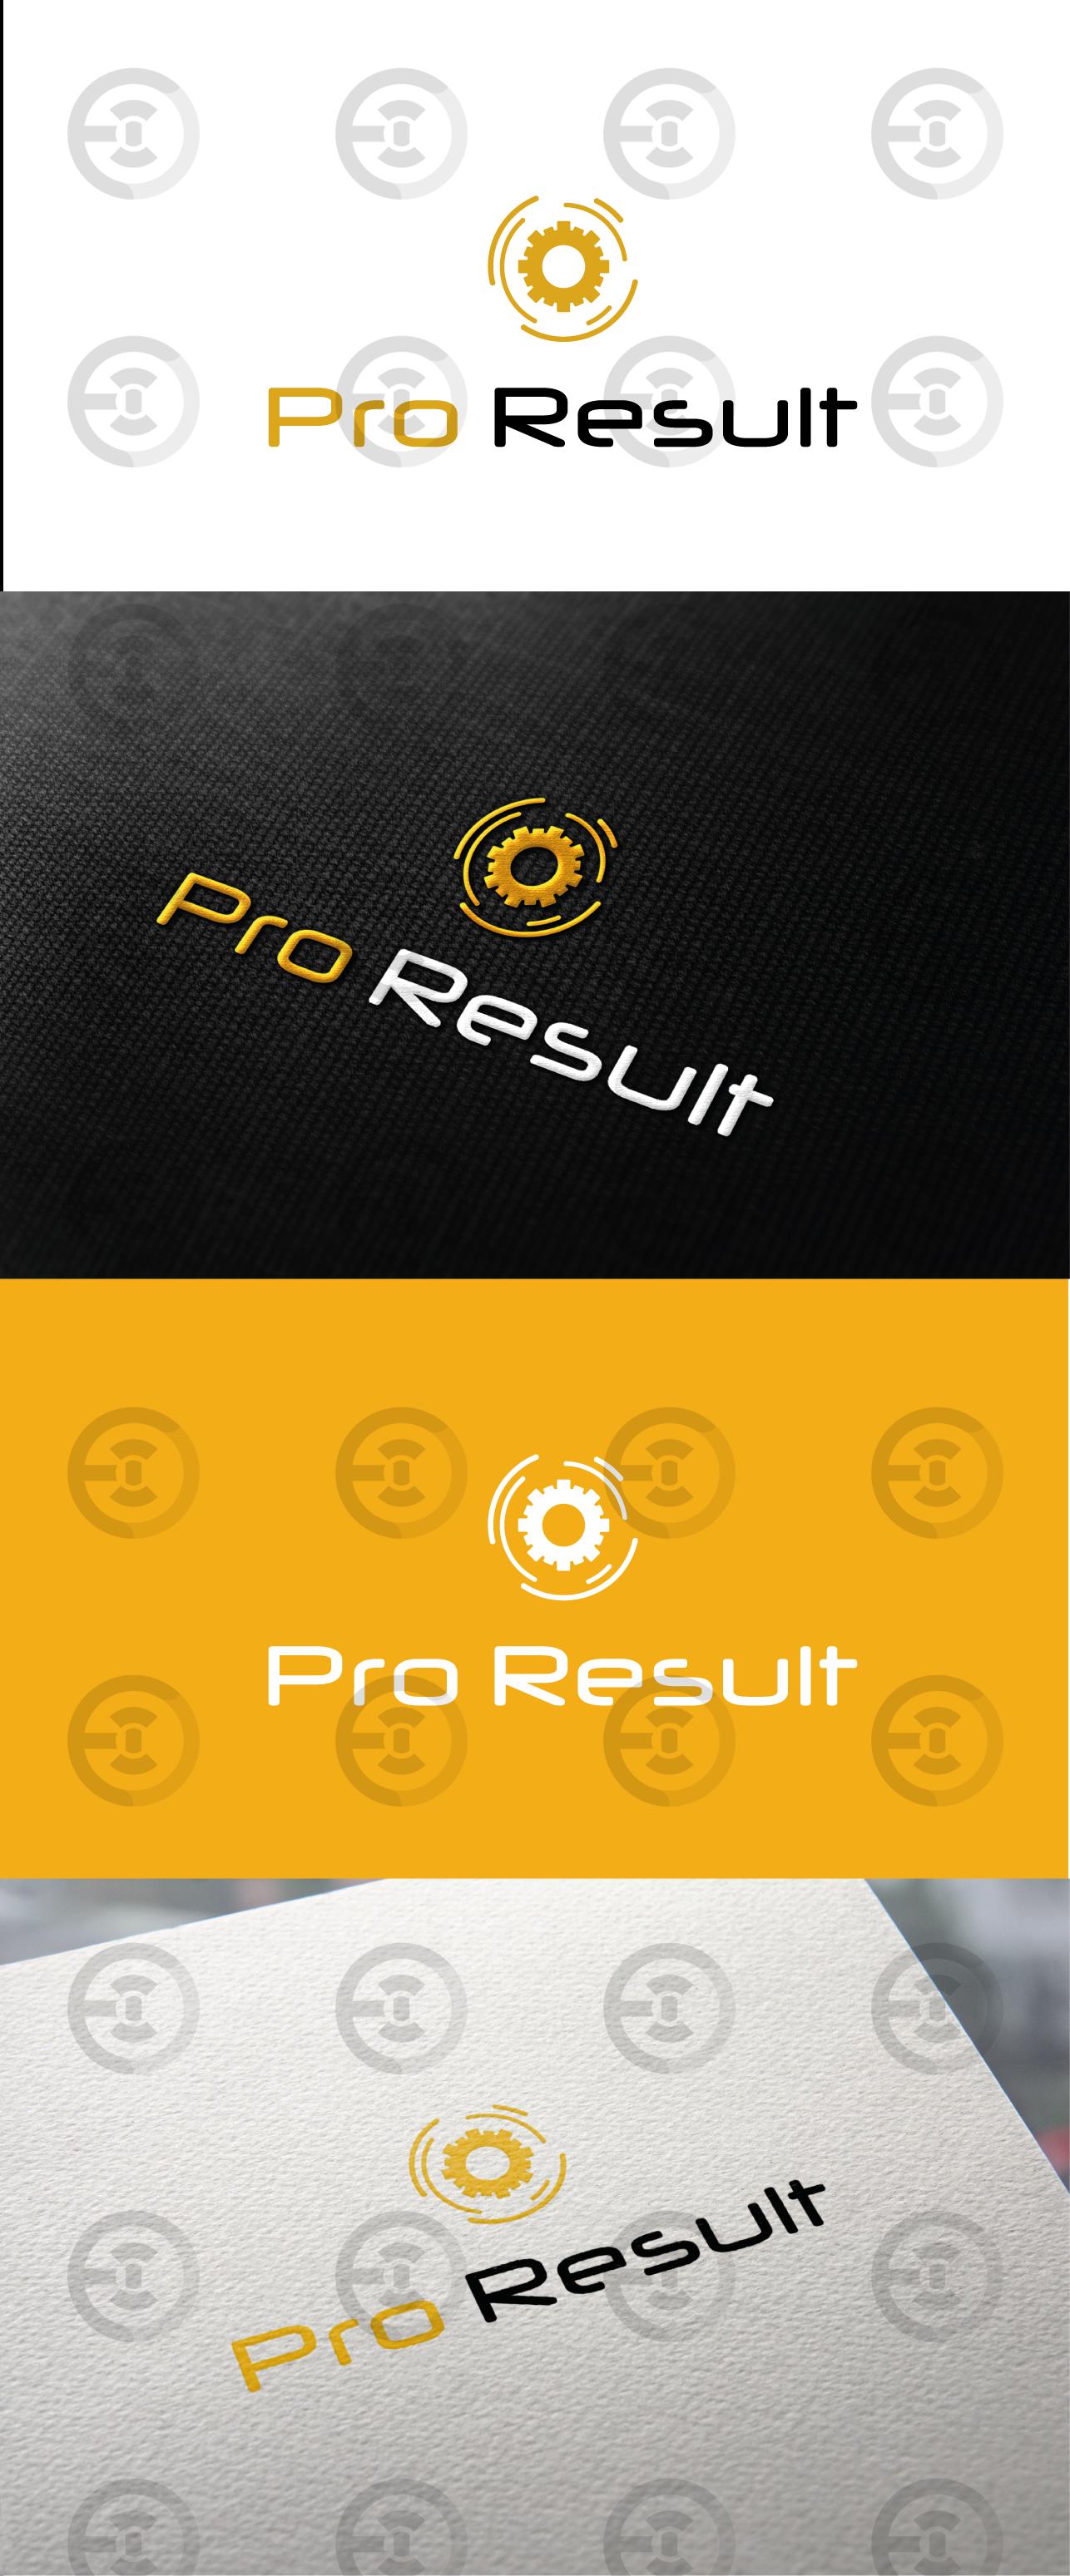 Pro-Result-02.png